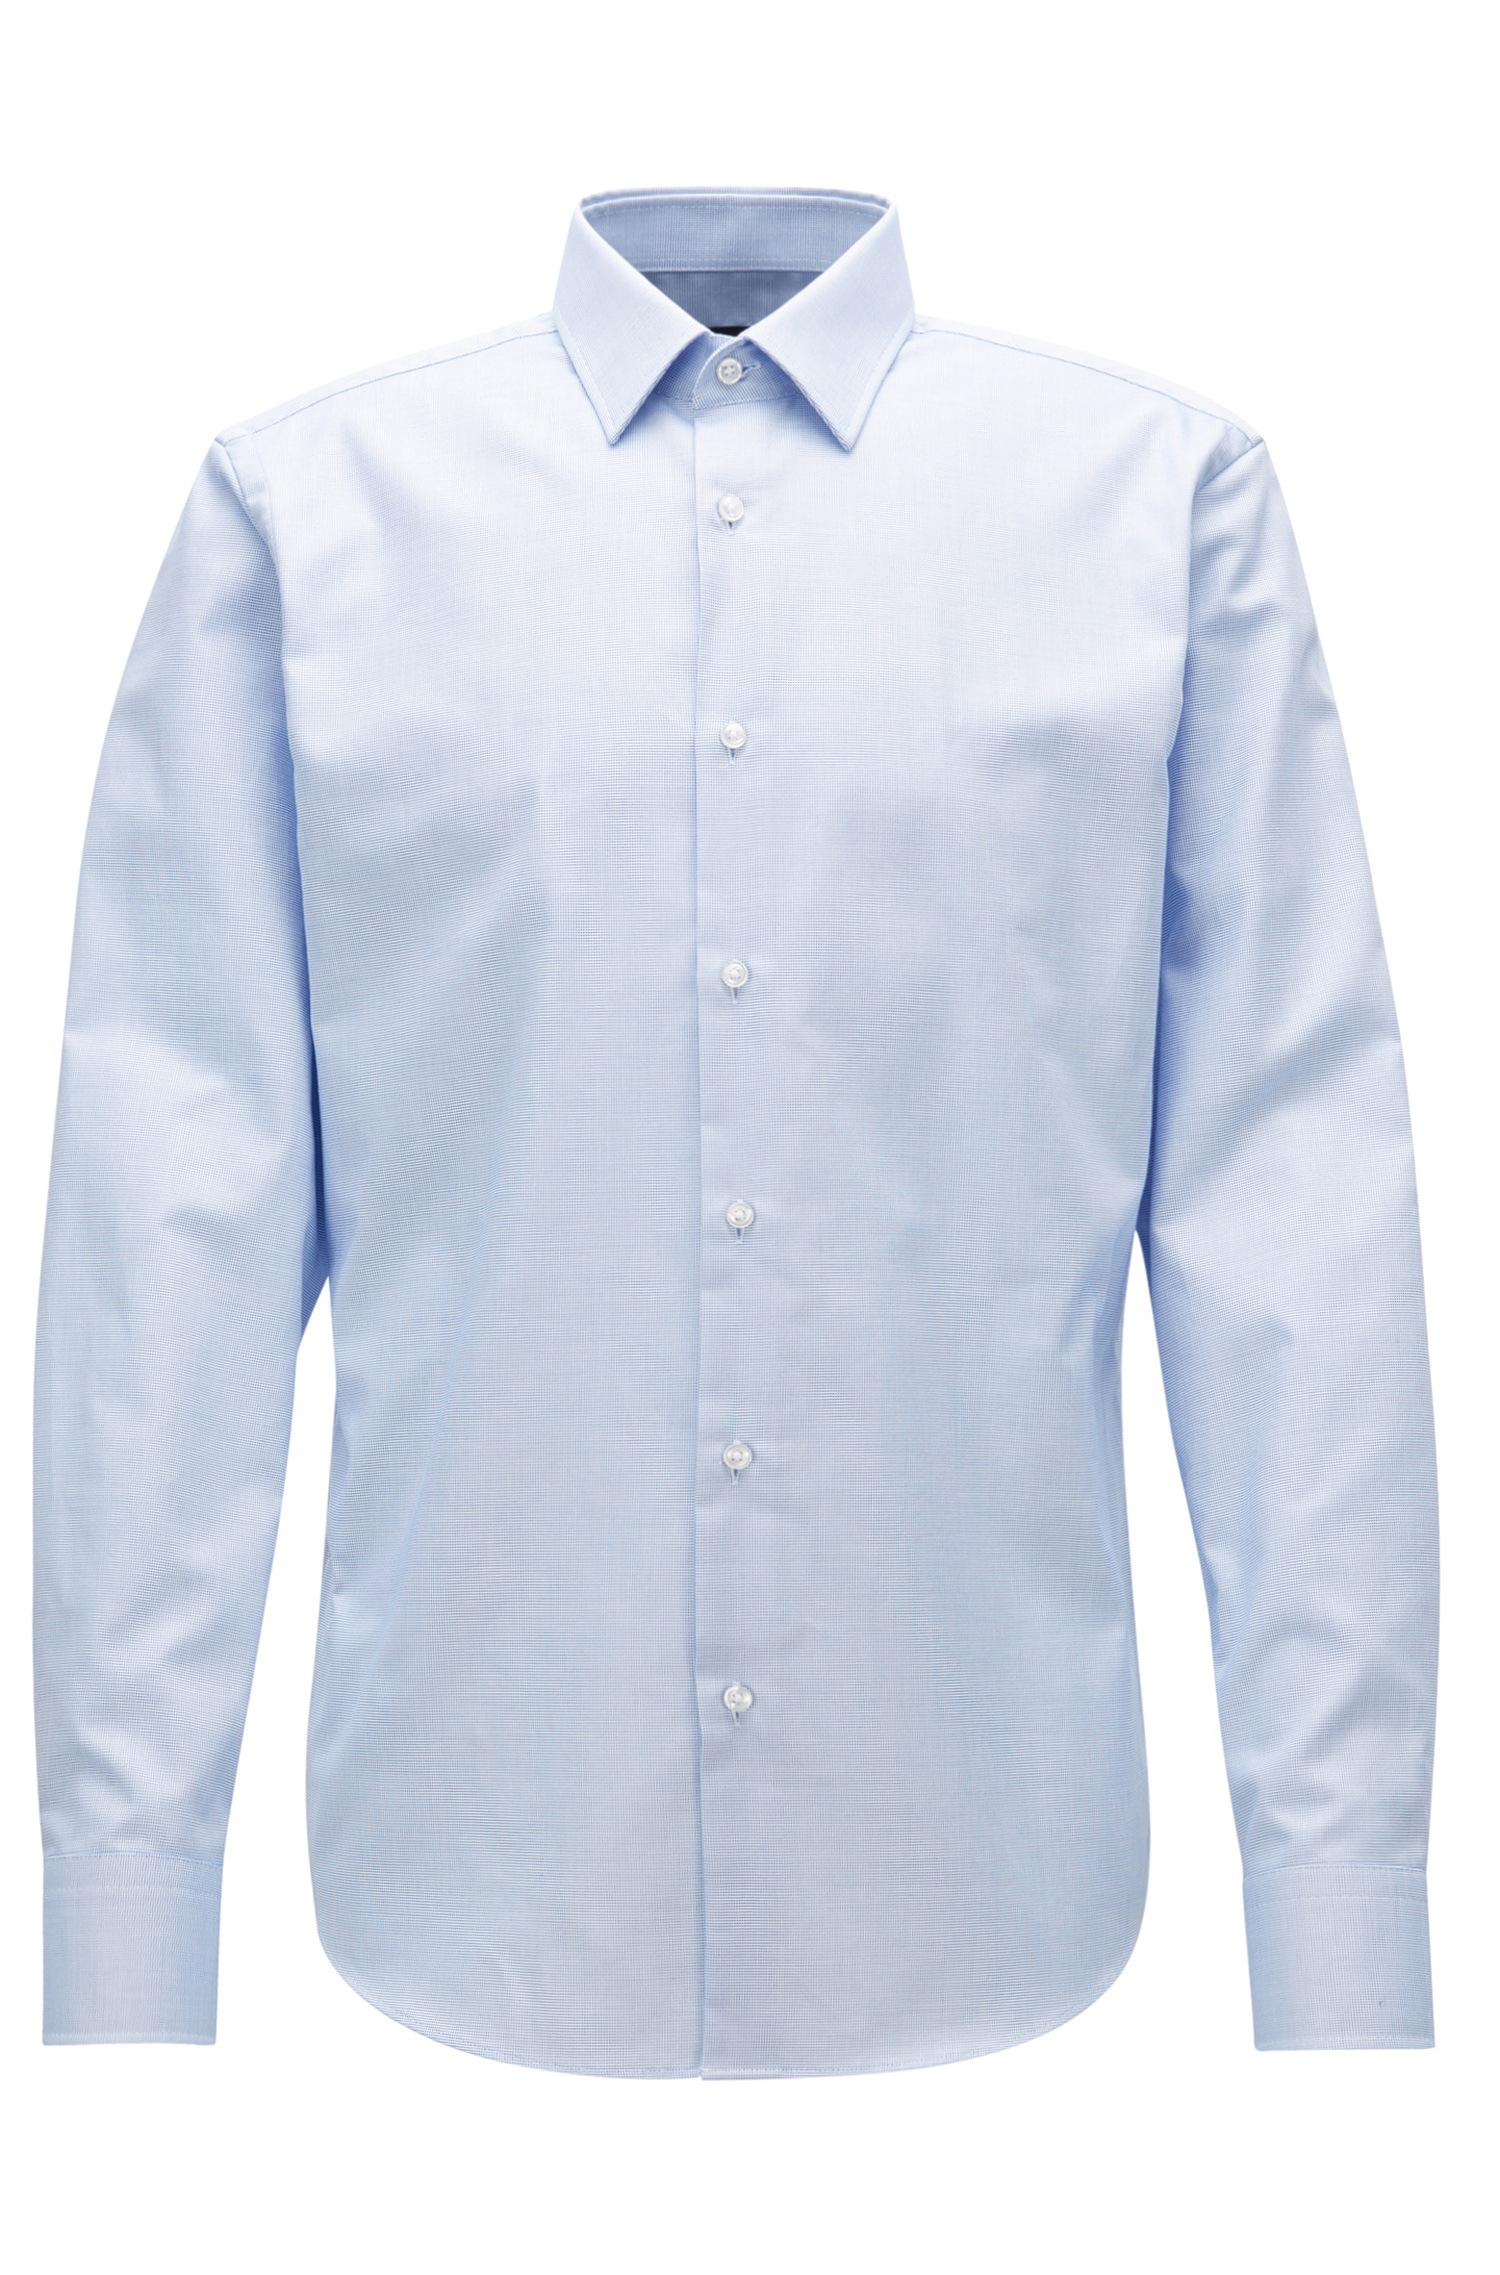 niedriger Preis hohe Qualitätsgarantie klassischer Chic Men's Blue Fresh Active Traveler Dress Shirt, Regular Fit | Enzo